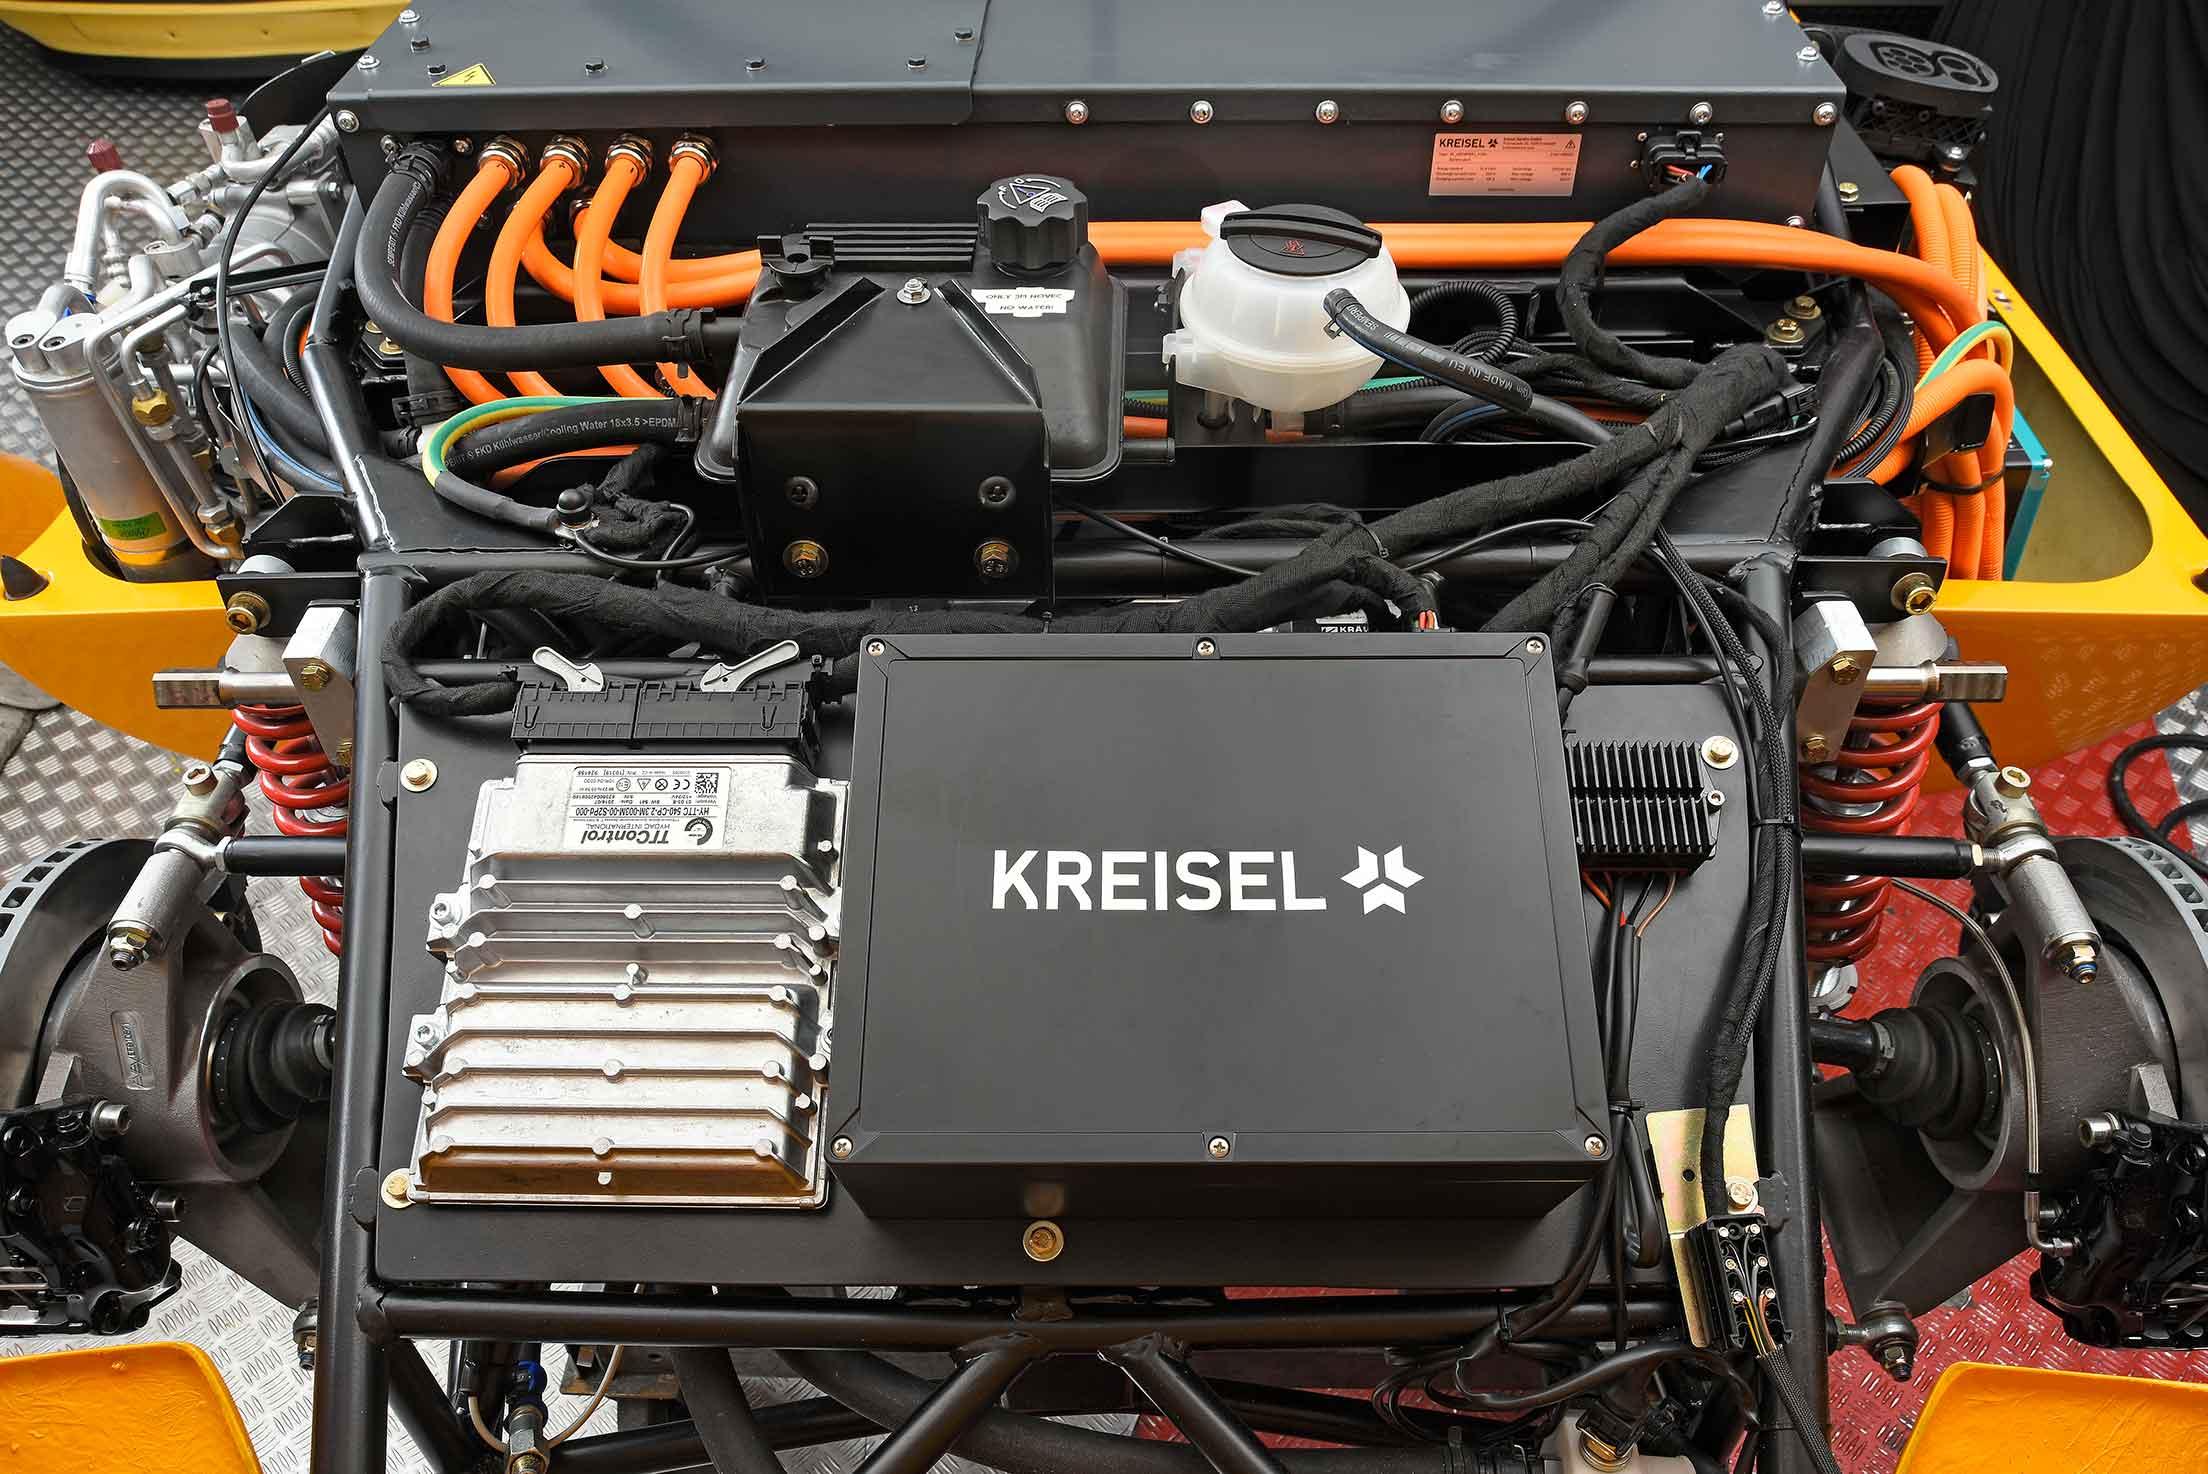 Kreisel-EVEX-910e-Kreisel-Technik_zoldautok